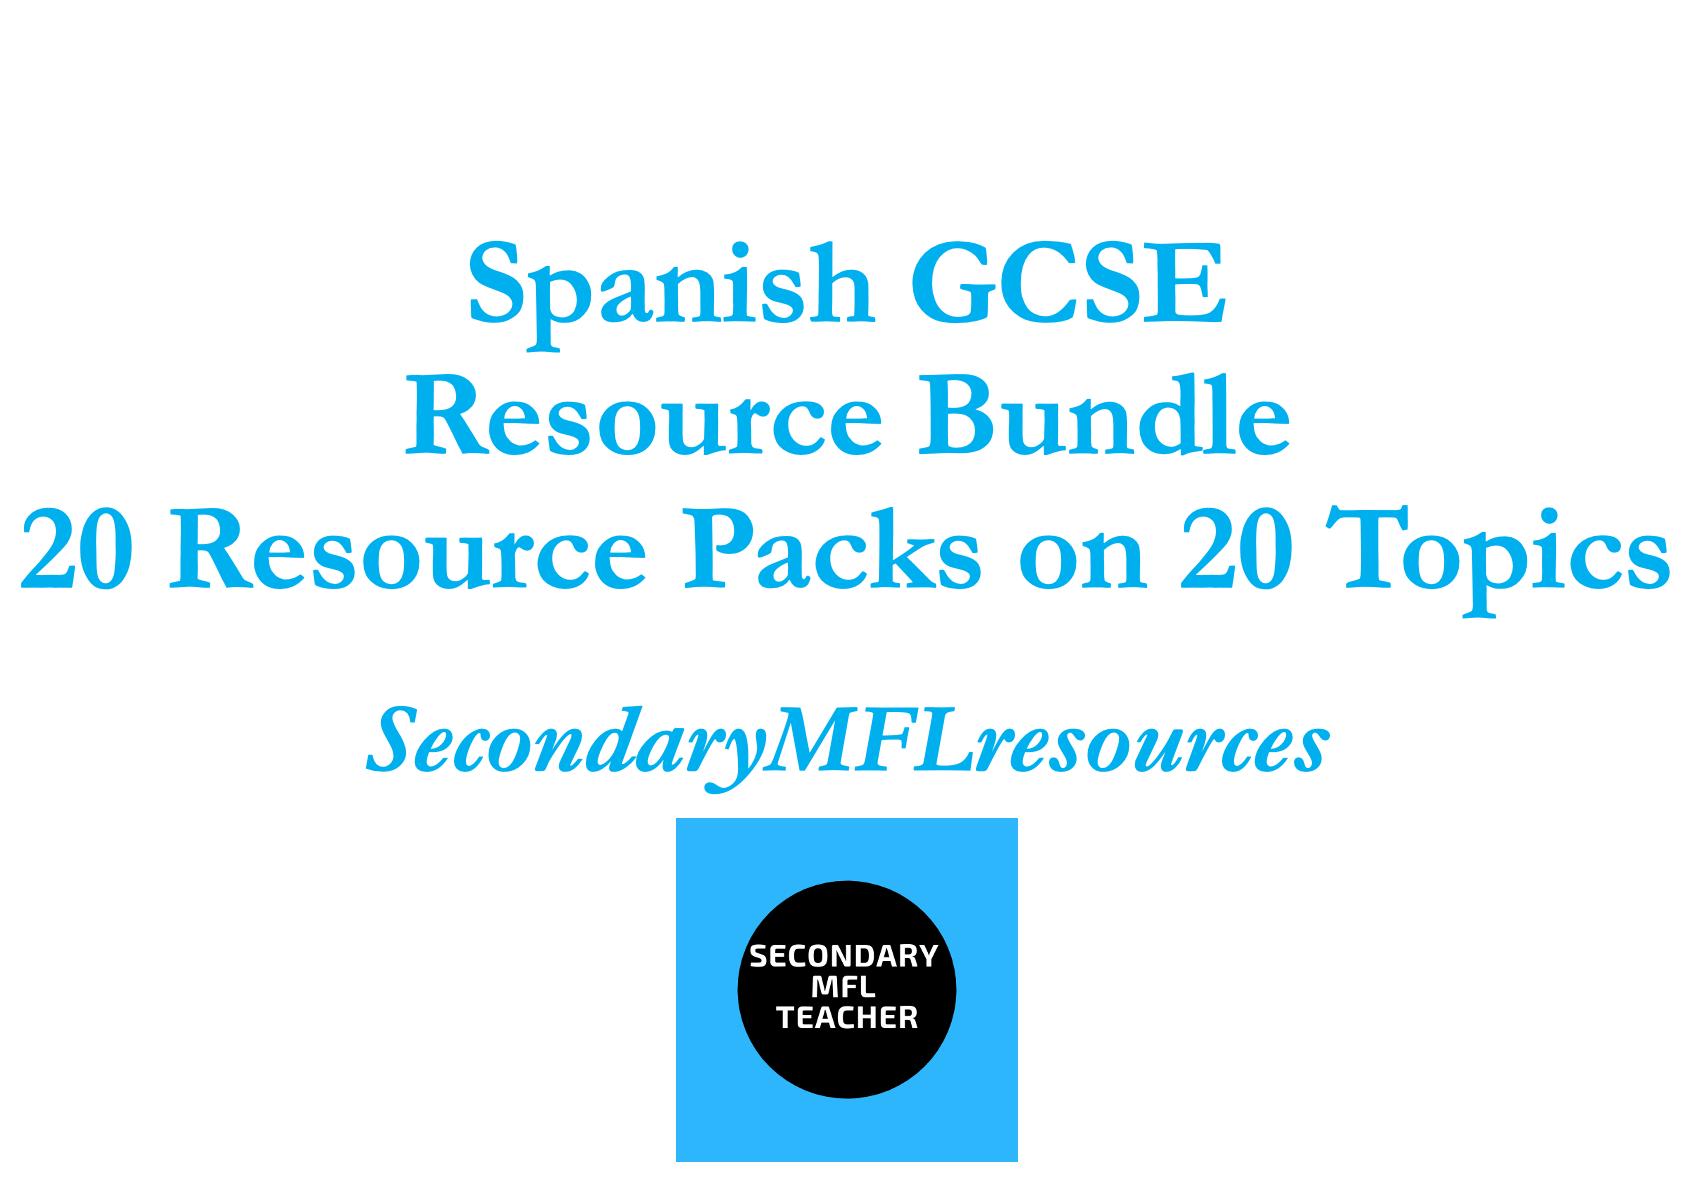 GCSE Spanish Bundle: 20 Resource Packs on 20 topics